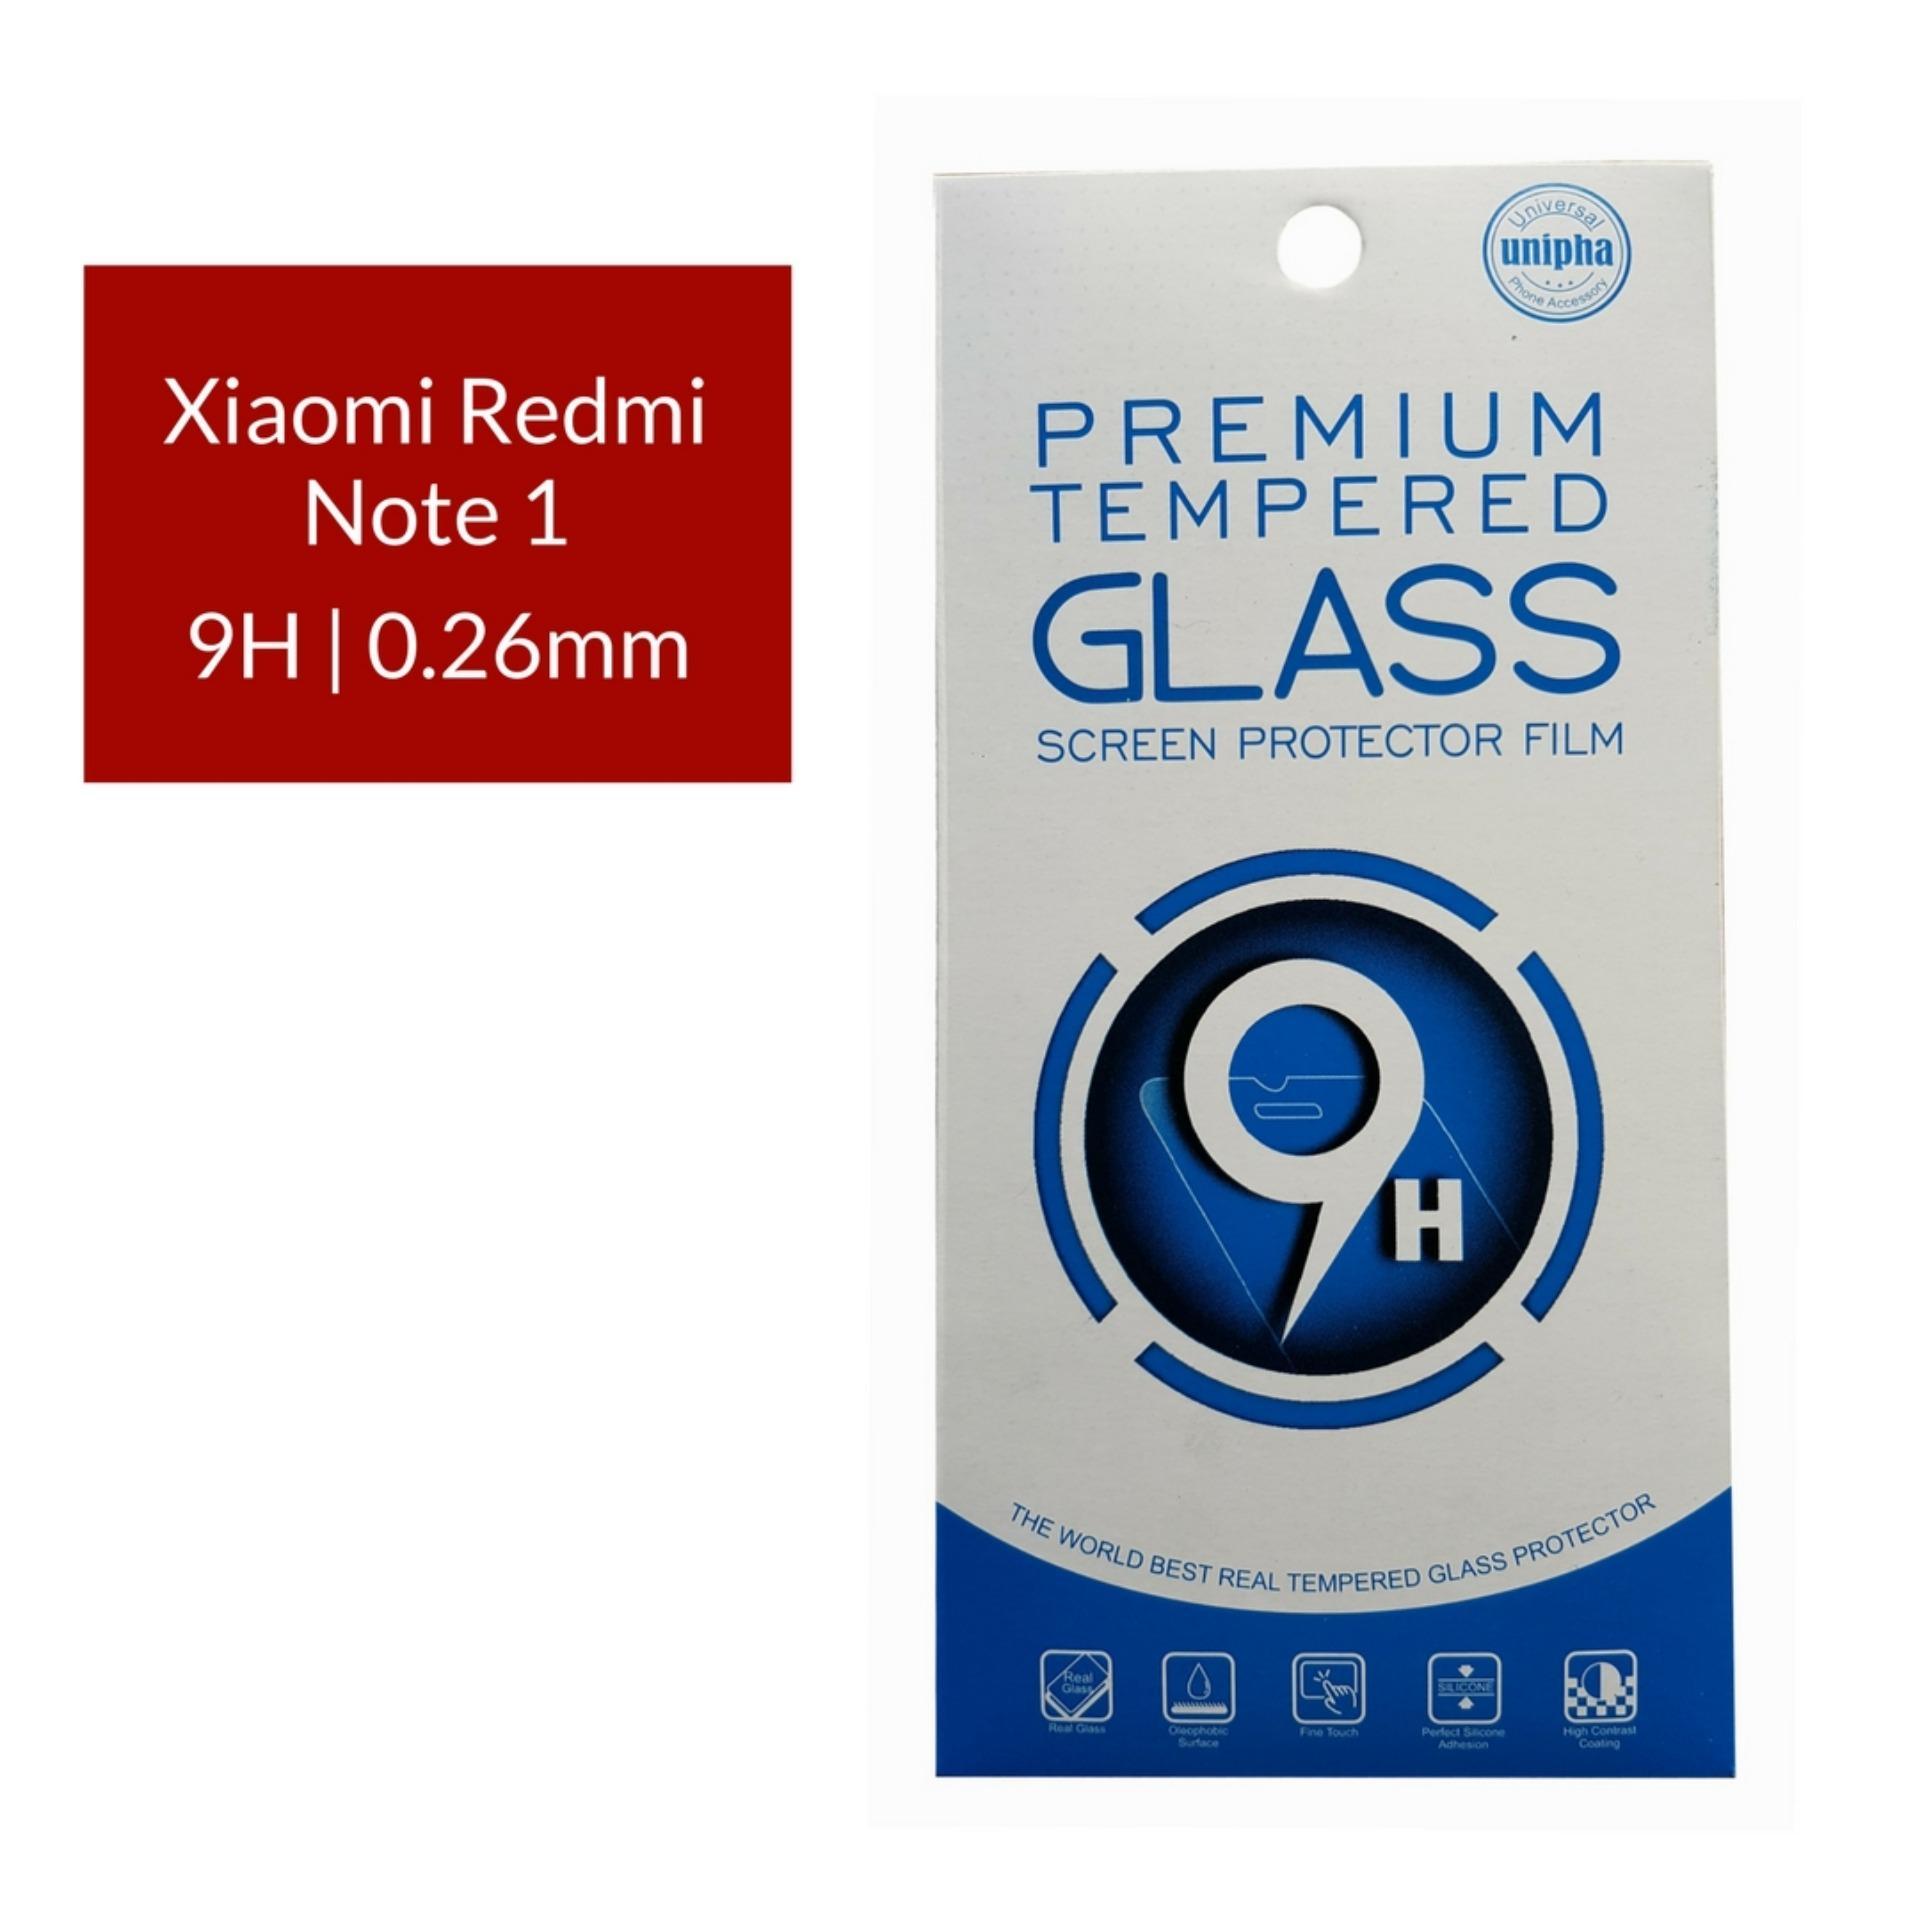 Unipha Premium Tempered Glass Screen Protector / Anti Gores Kaca Xiaomi Redmi Note 1 - Bening